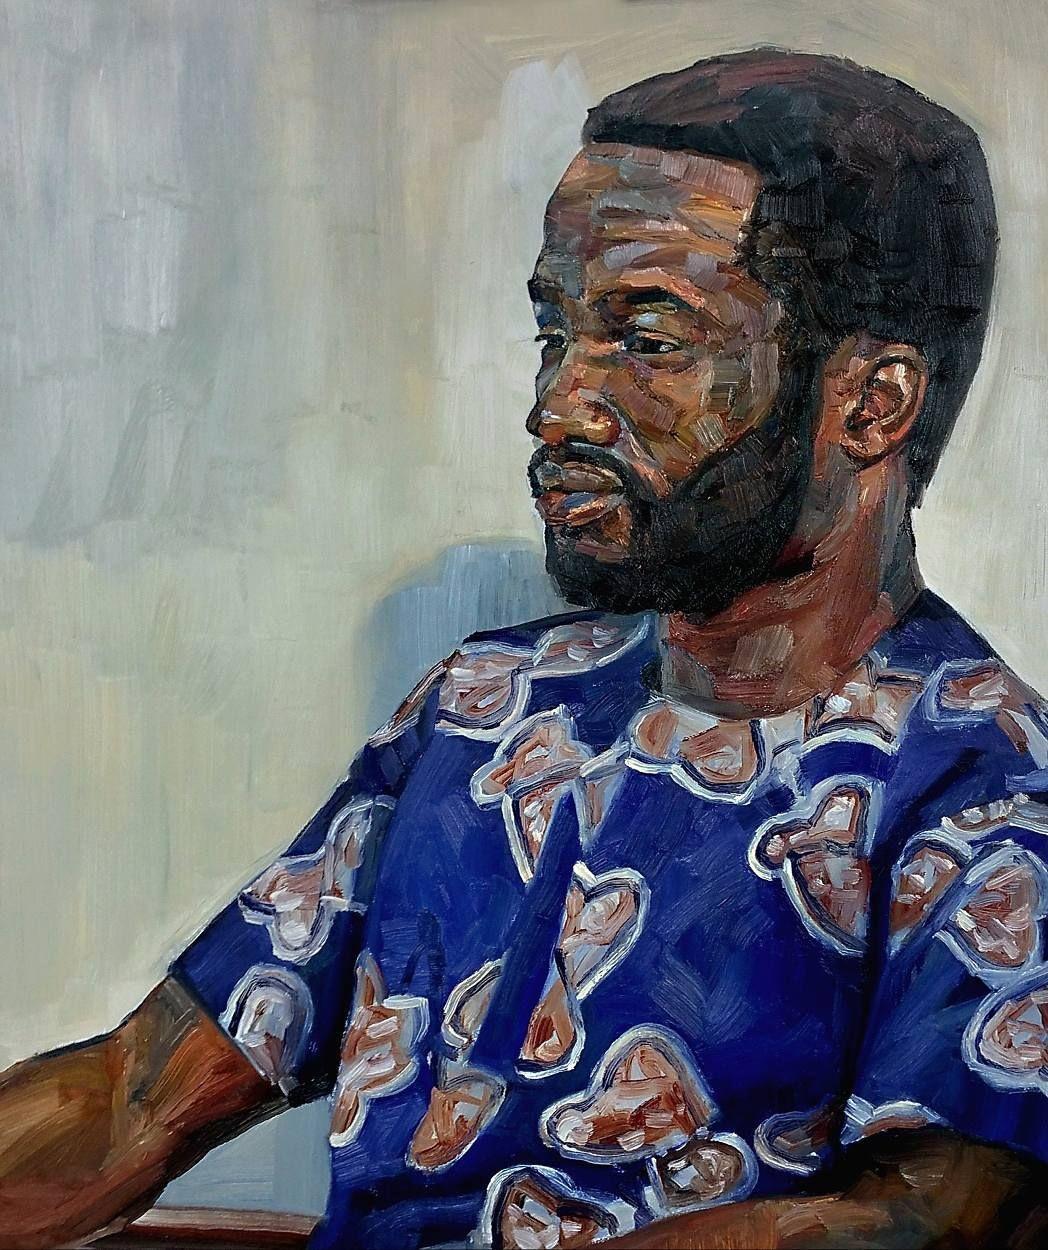 Here S The Finished Painting And Timelapse Of My Winning Portrait Of Sopedirisu From Last Nights Heat Of Sky Portraitartistoftheyear